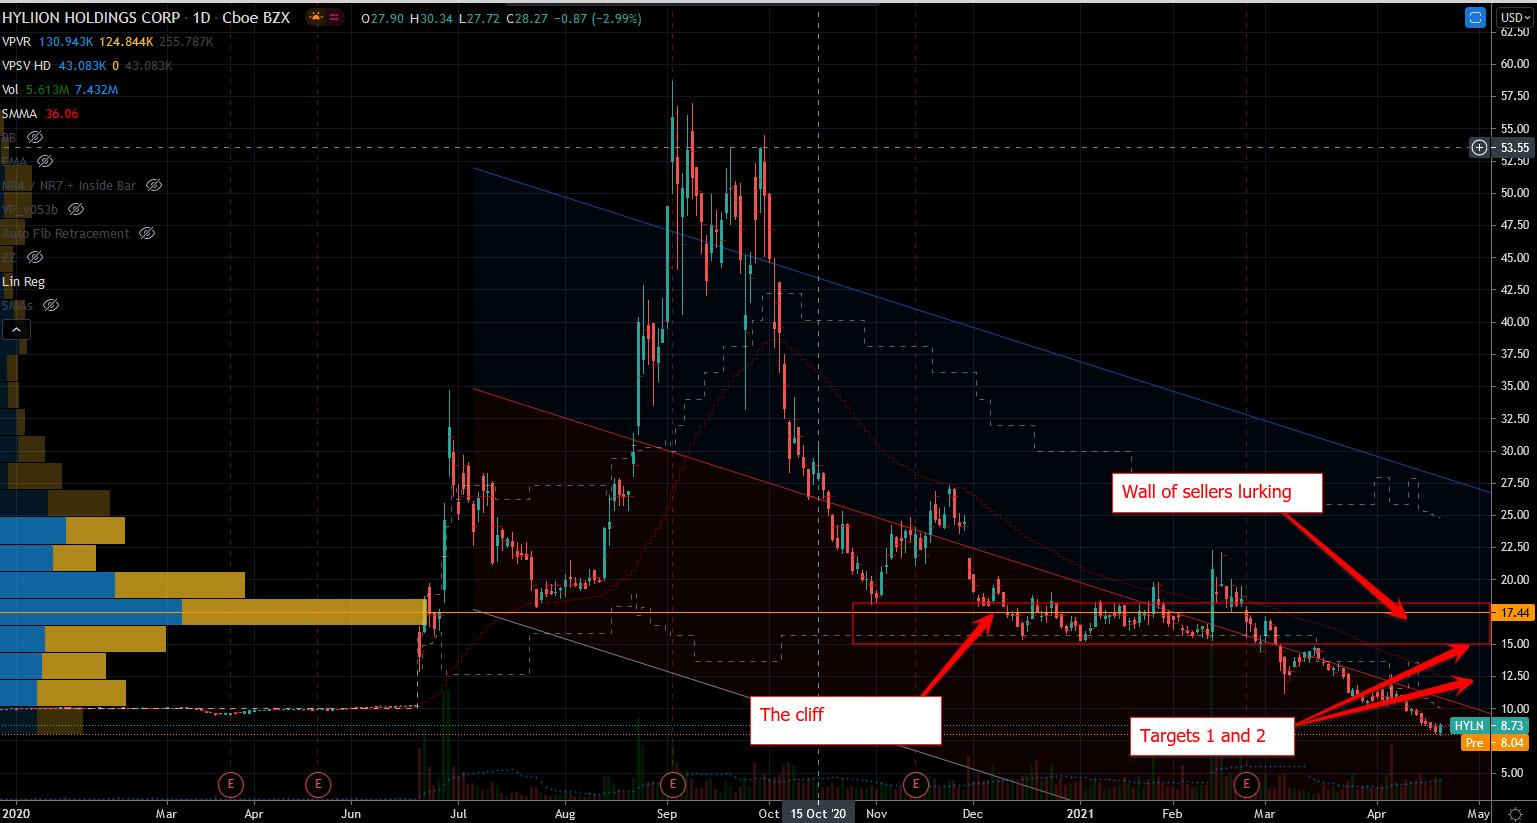 Loser Stocks: Hyliion (HYLN) Stock Chart Showing No Bottom Yet